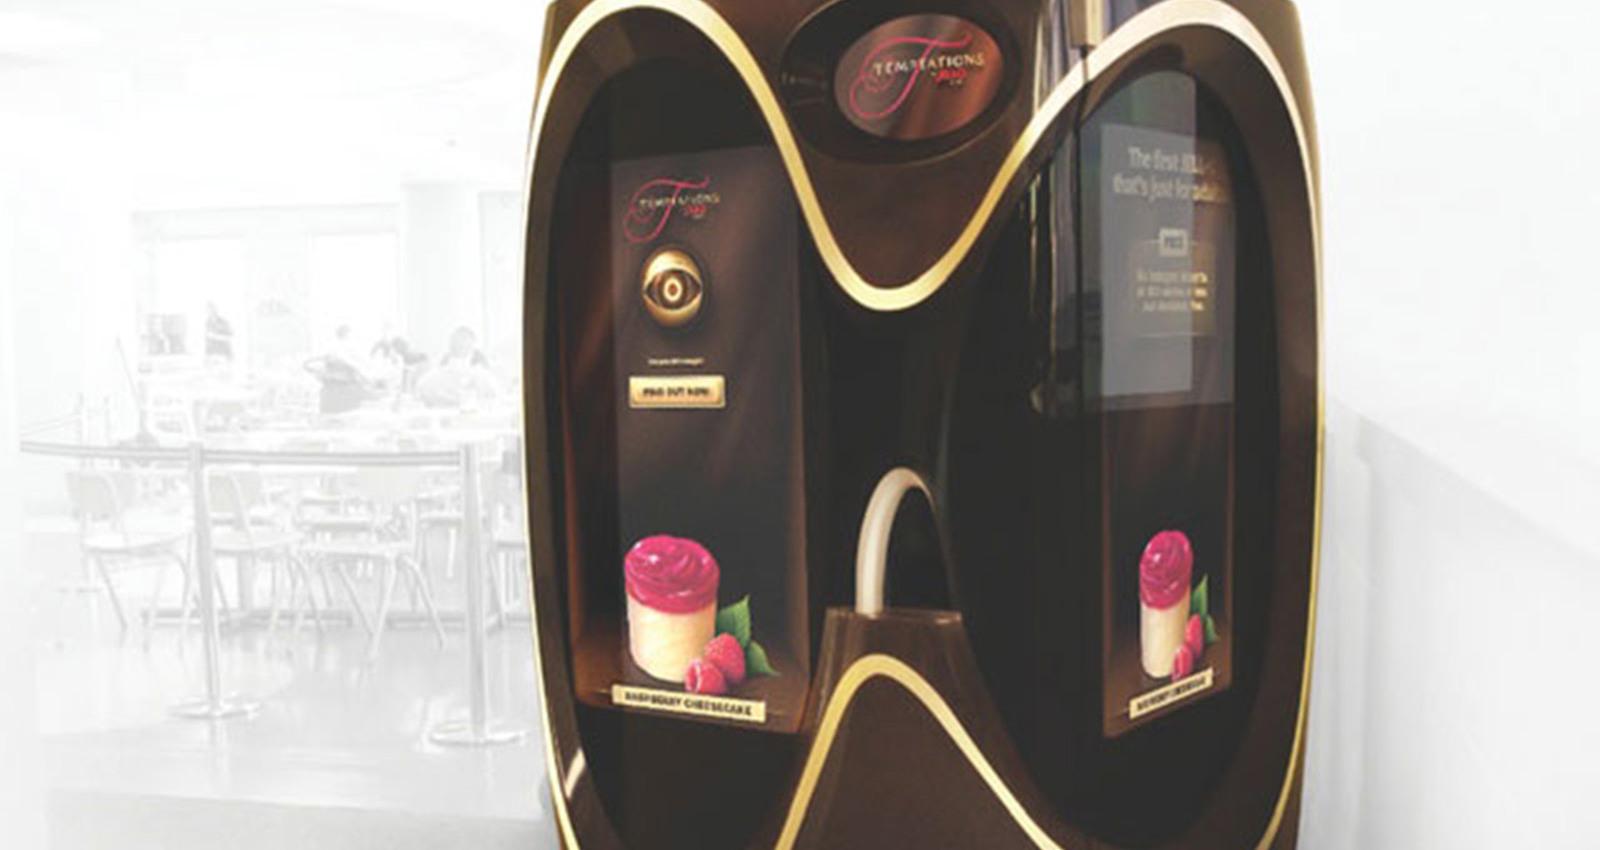 Temptations Sampling Machine